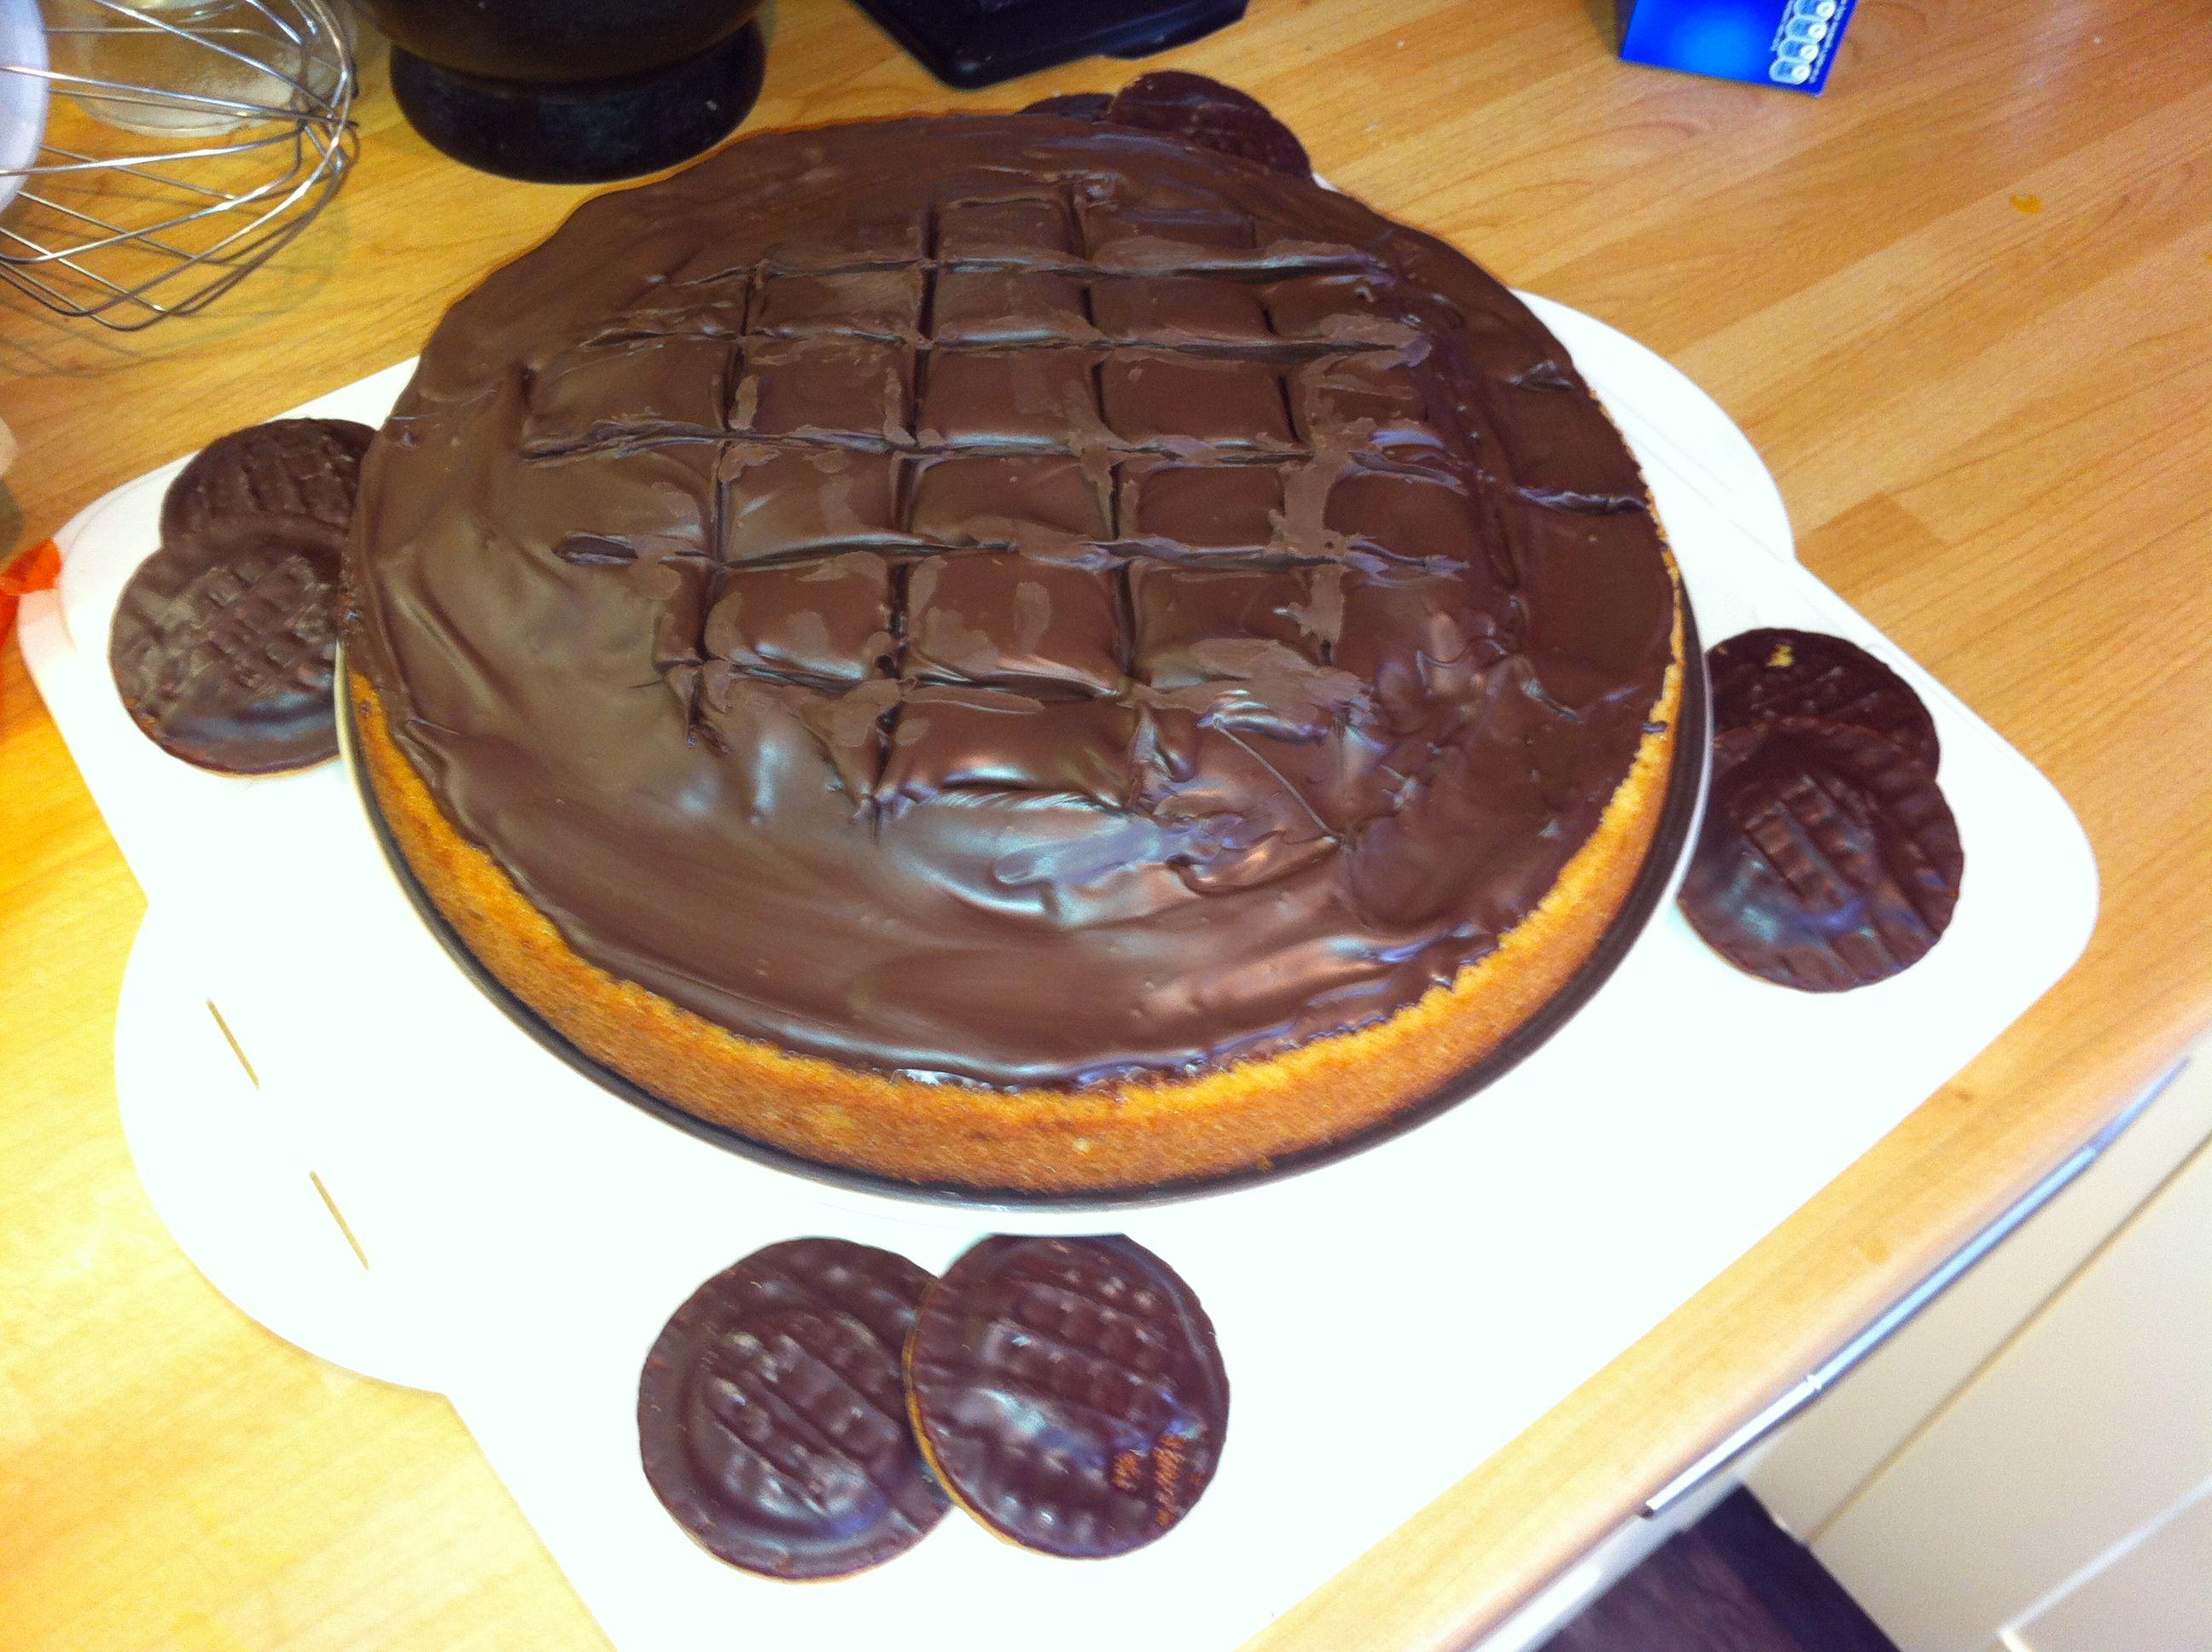 Giant 'Jaffa Cake' ...